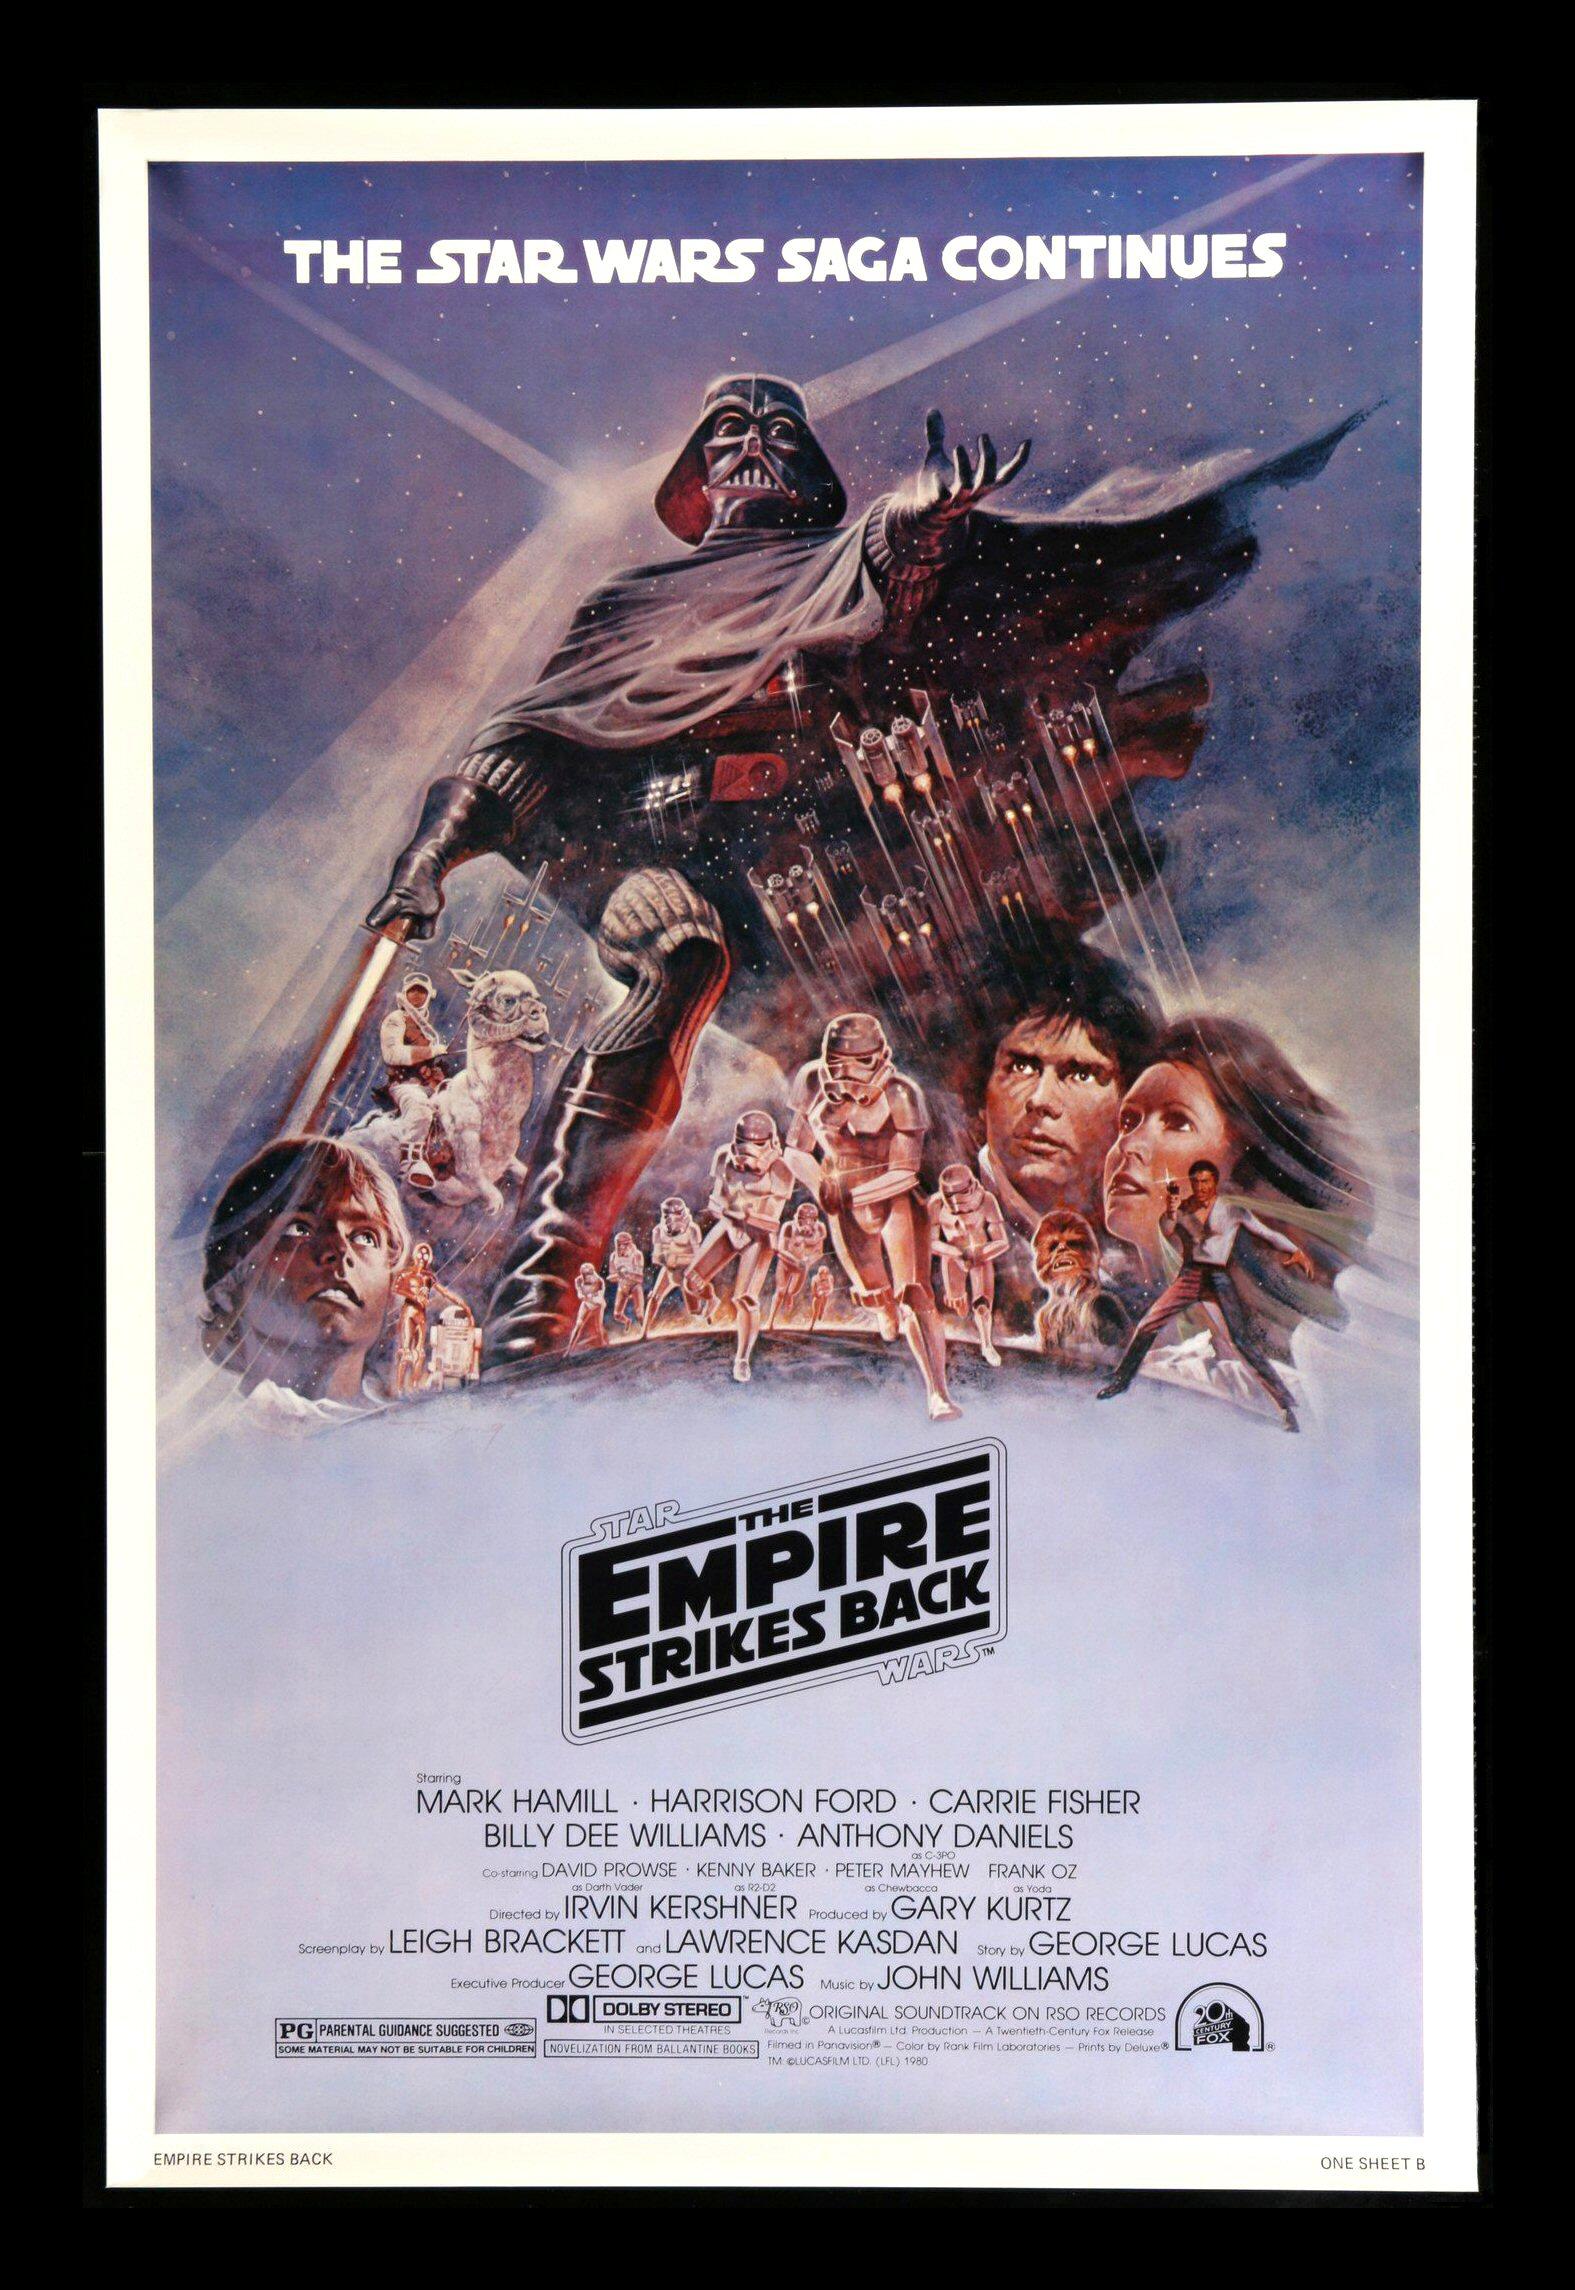 the empire strikes back cinemasterpieces rare purple b